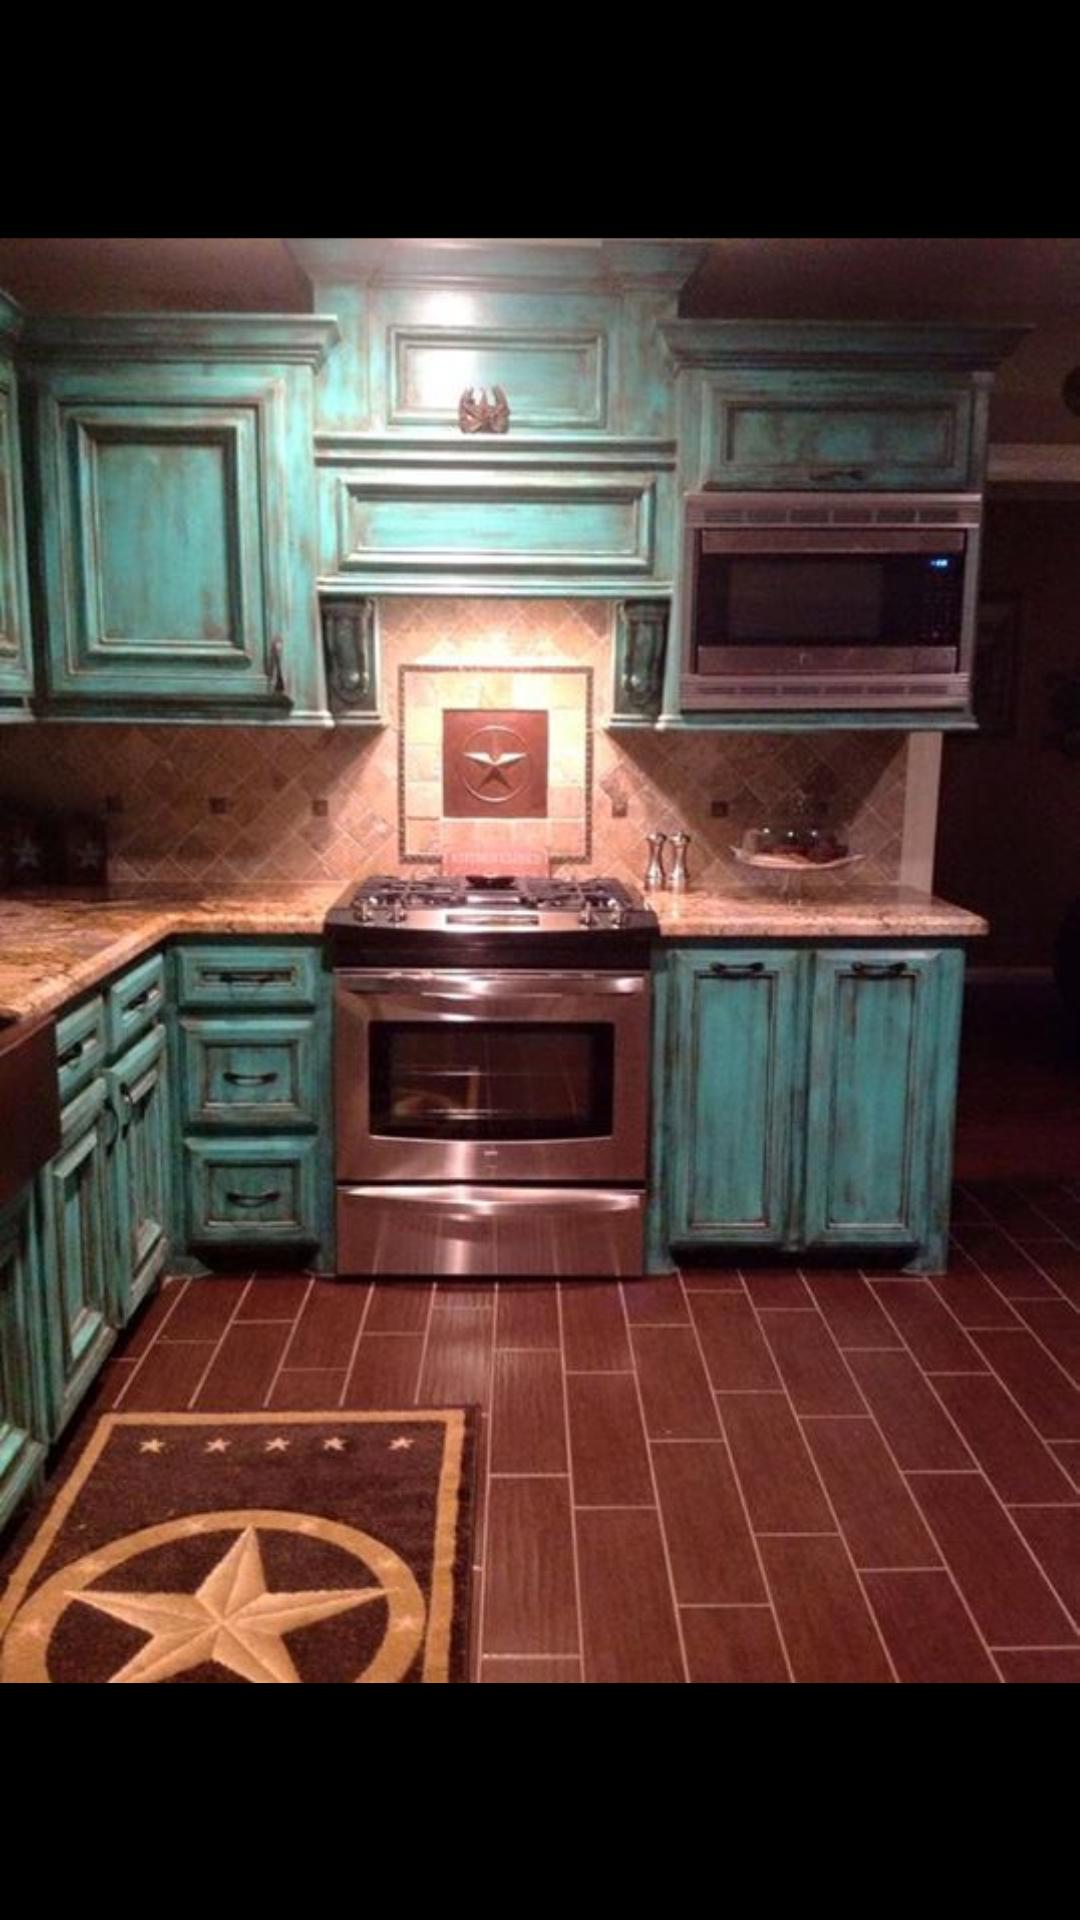 My future kitchen Home decor ❤ Pinterest